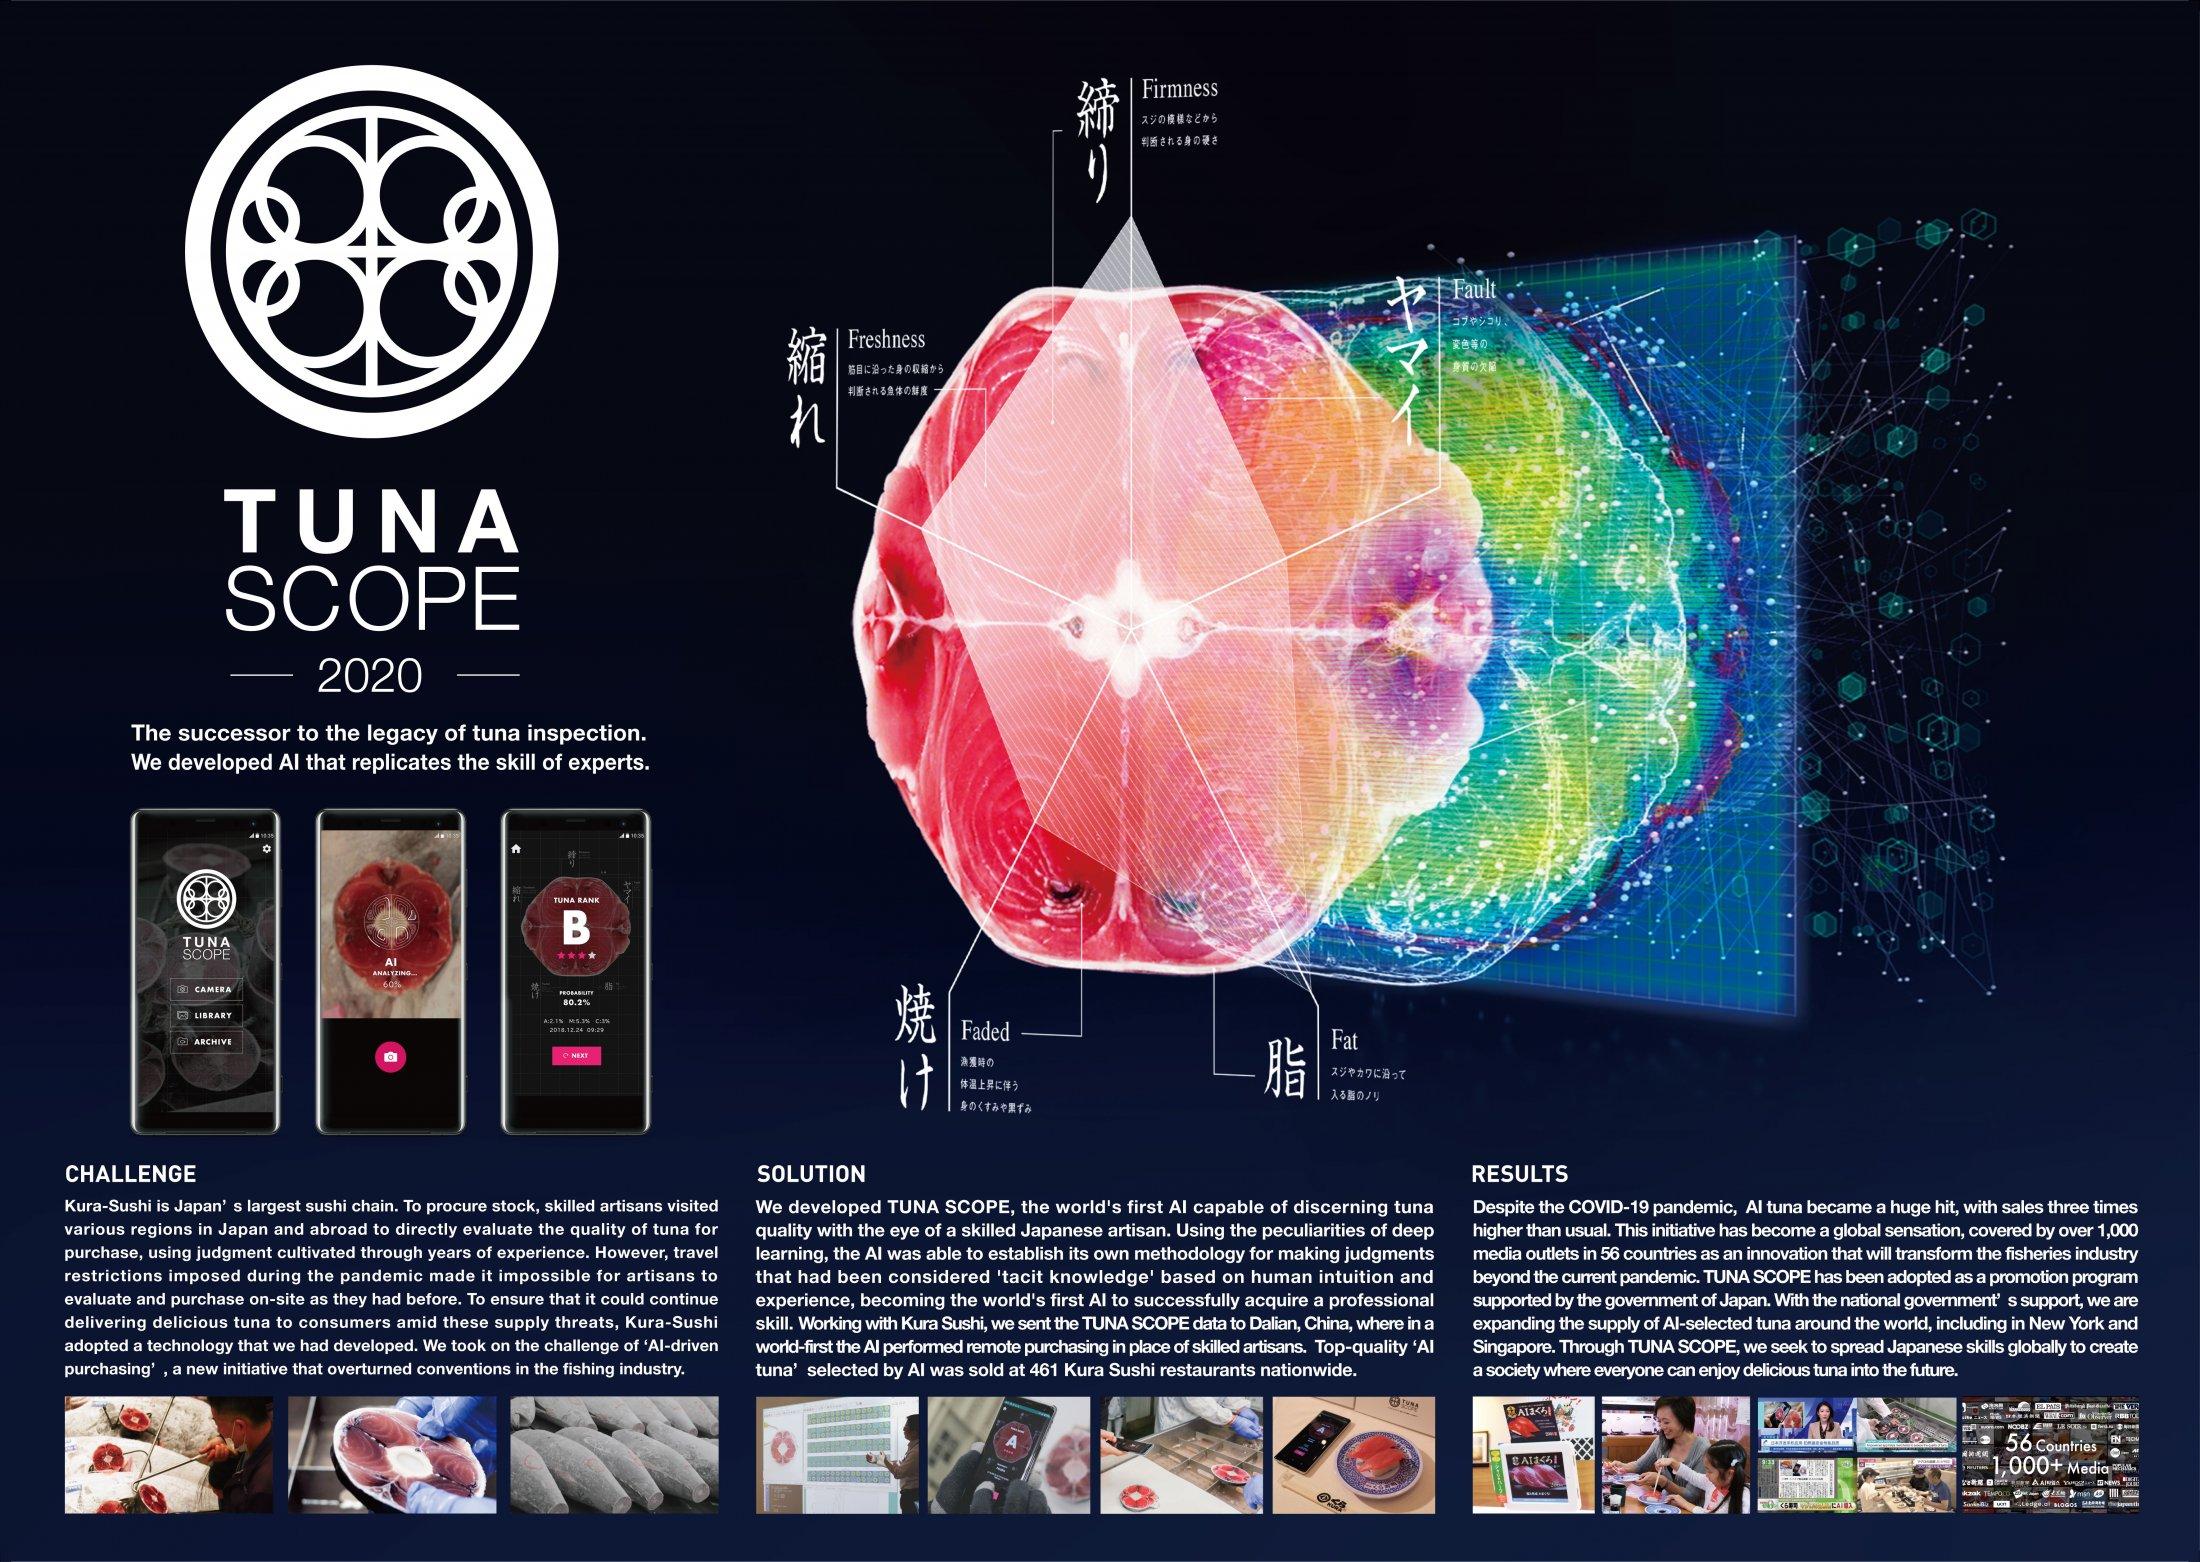 Thumbnail for TUNA SCOPE 2020